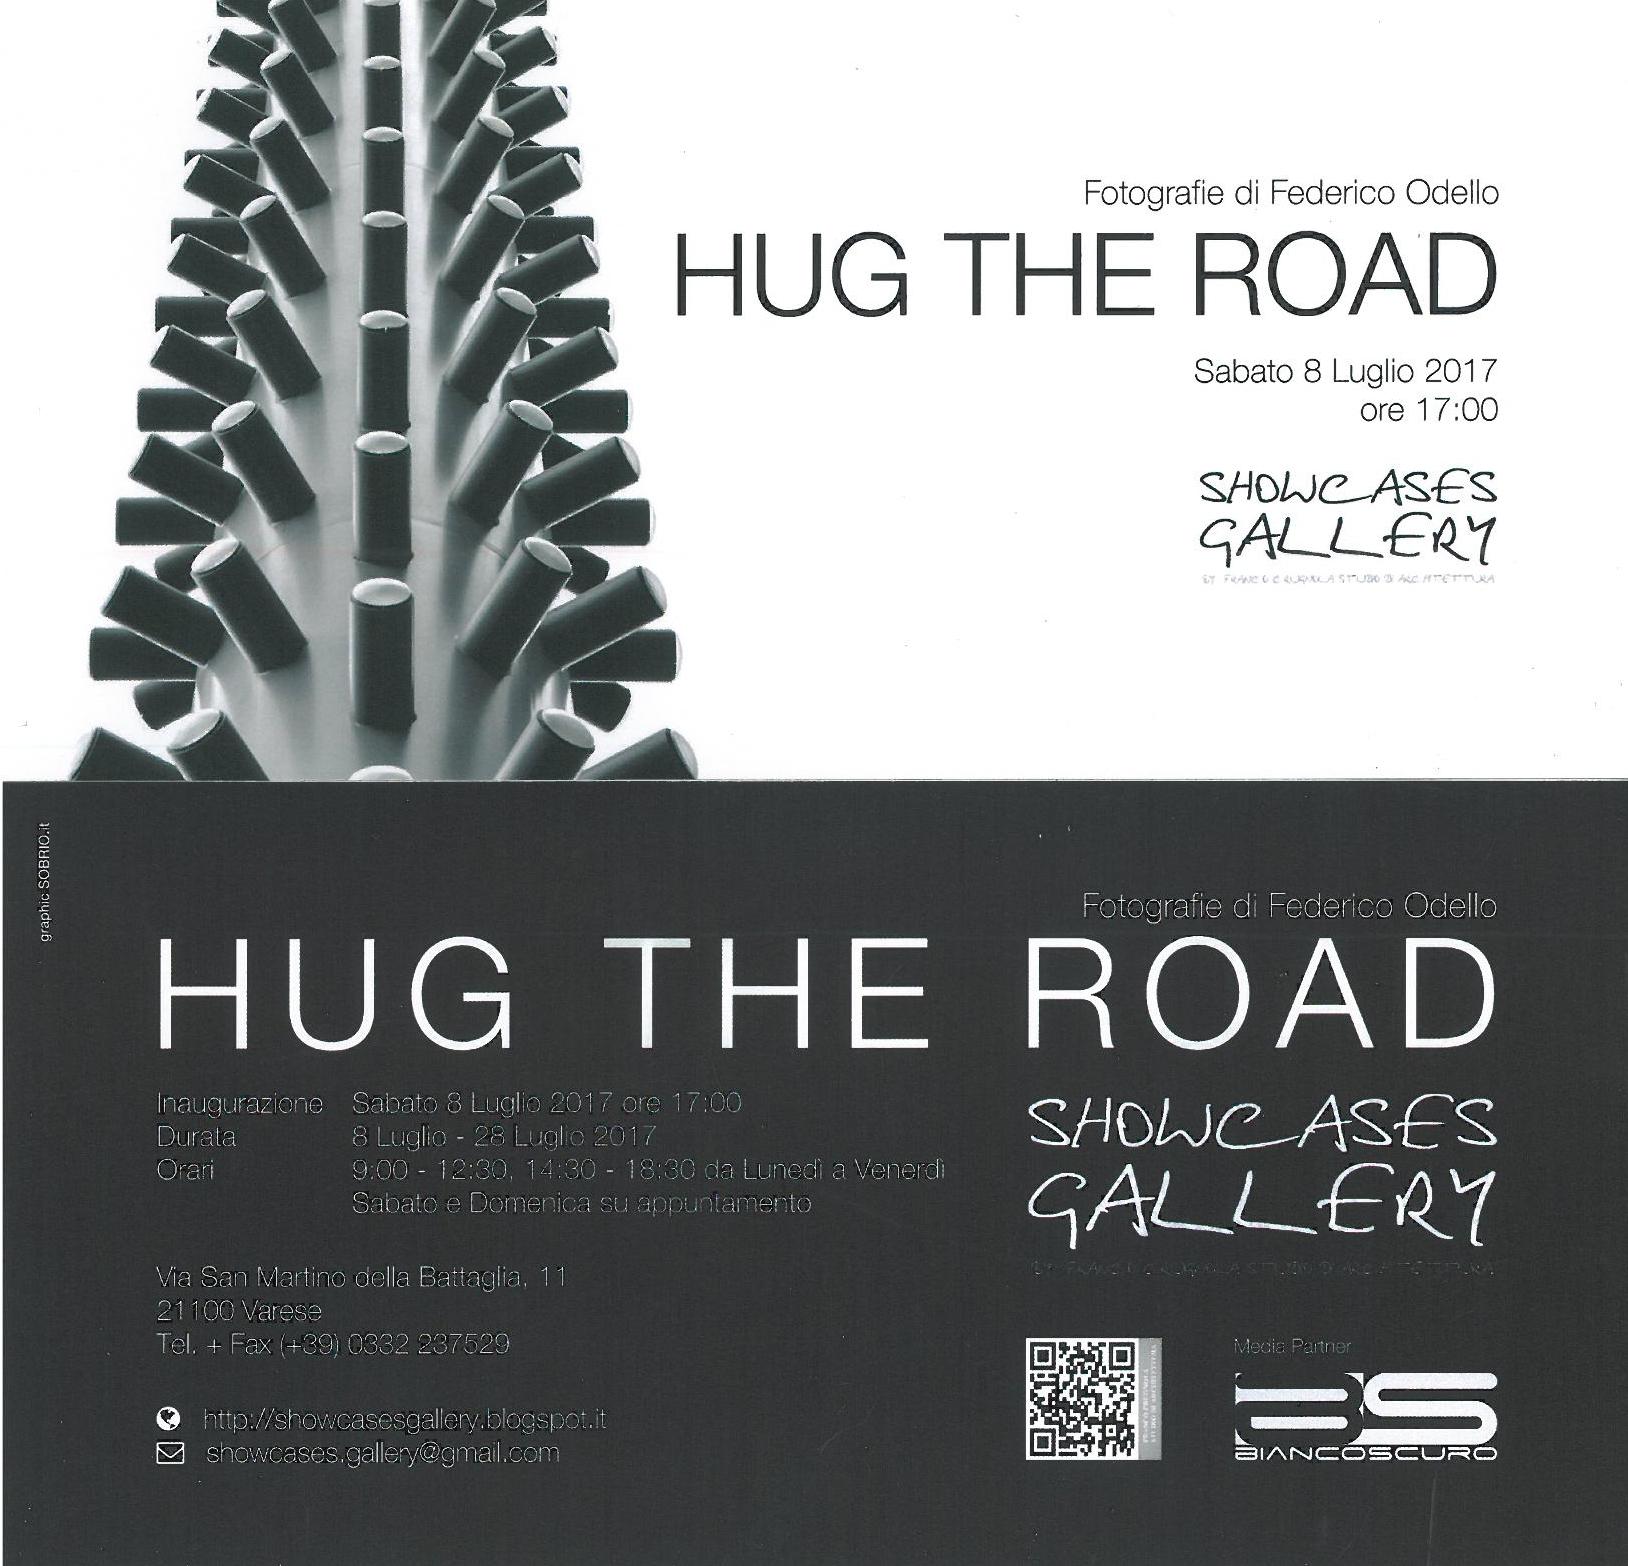 HUG THE ROAD